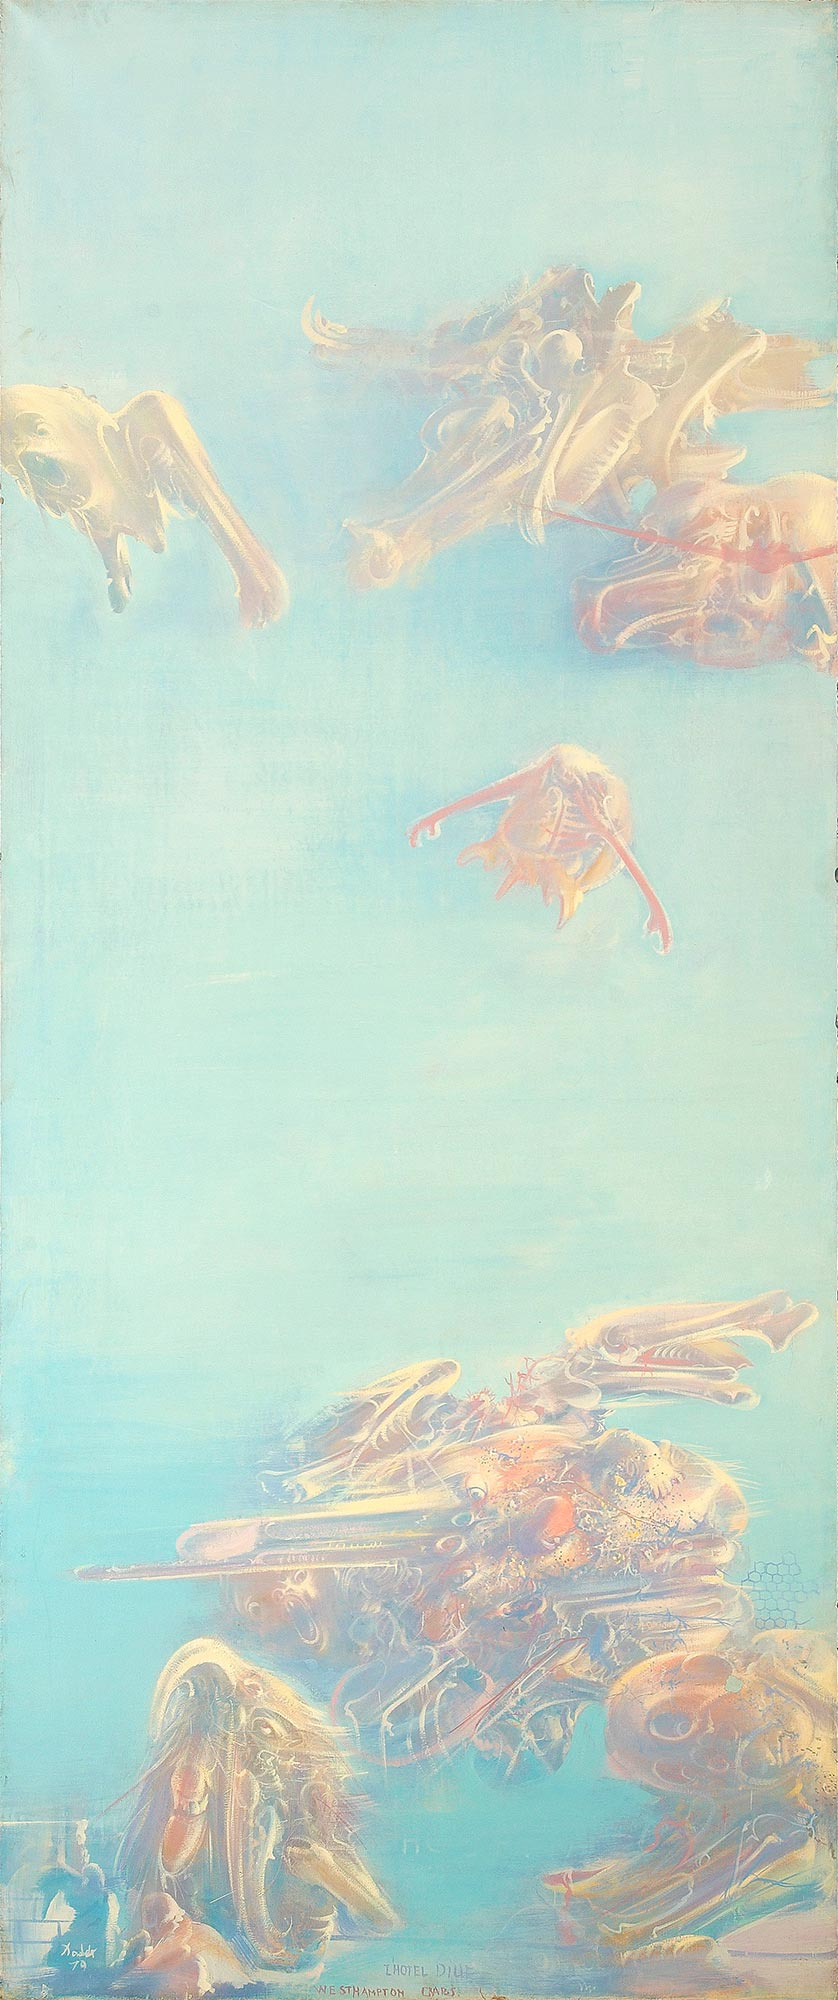 Dado: L'Hôtel-Dieu, Westhampton Crabs, 1979